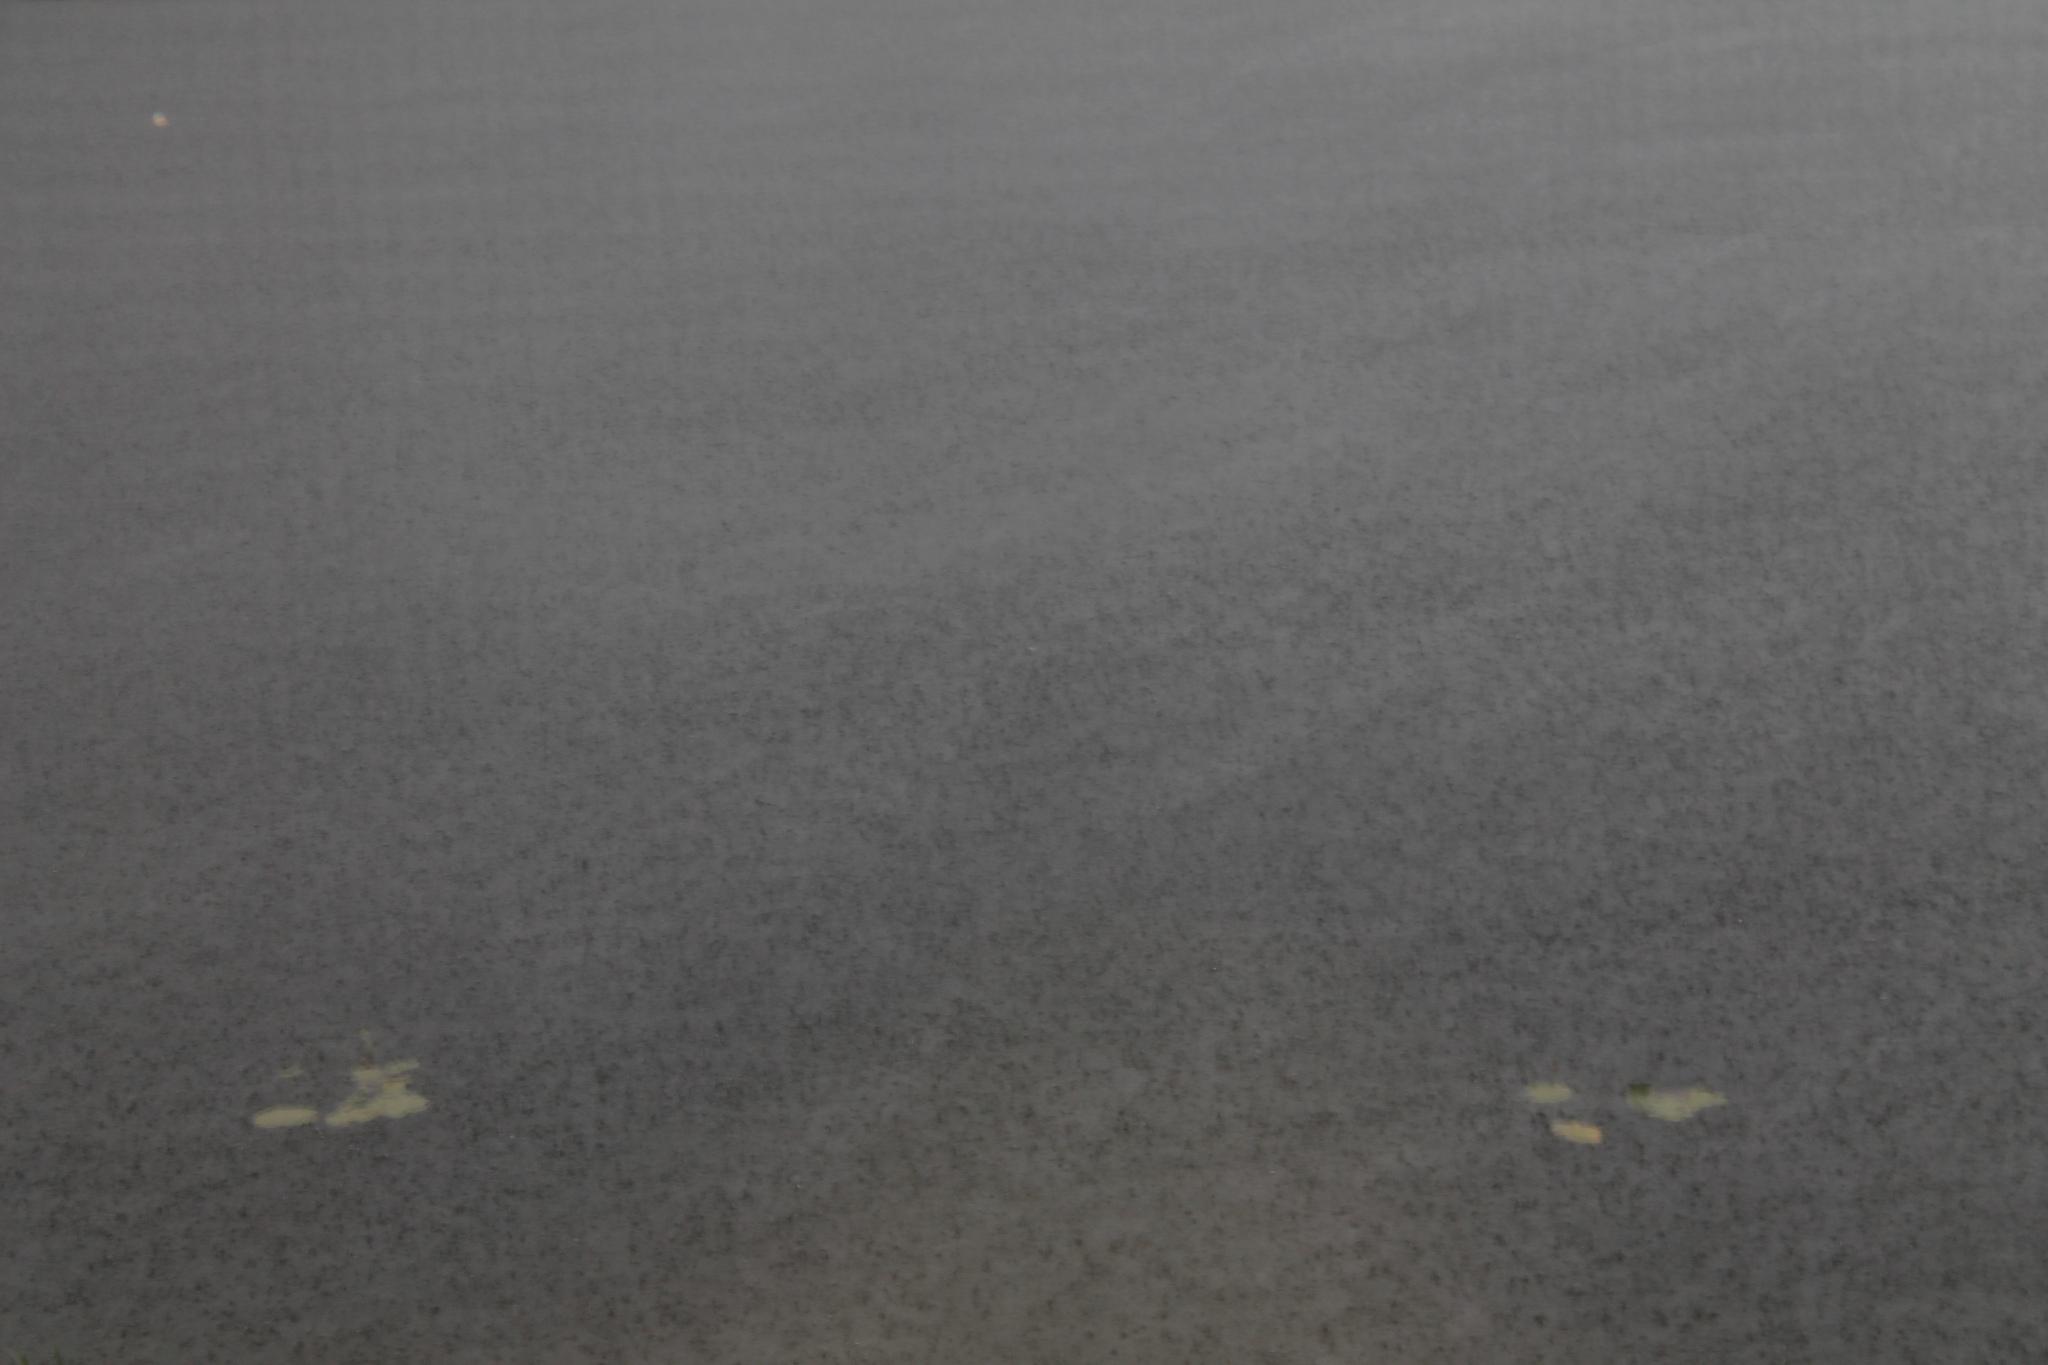 fig. i: summer rain